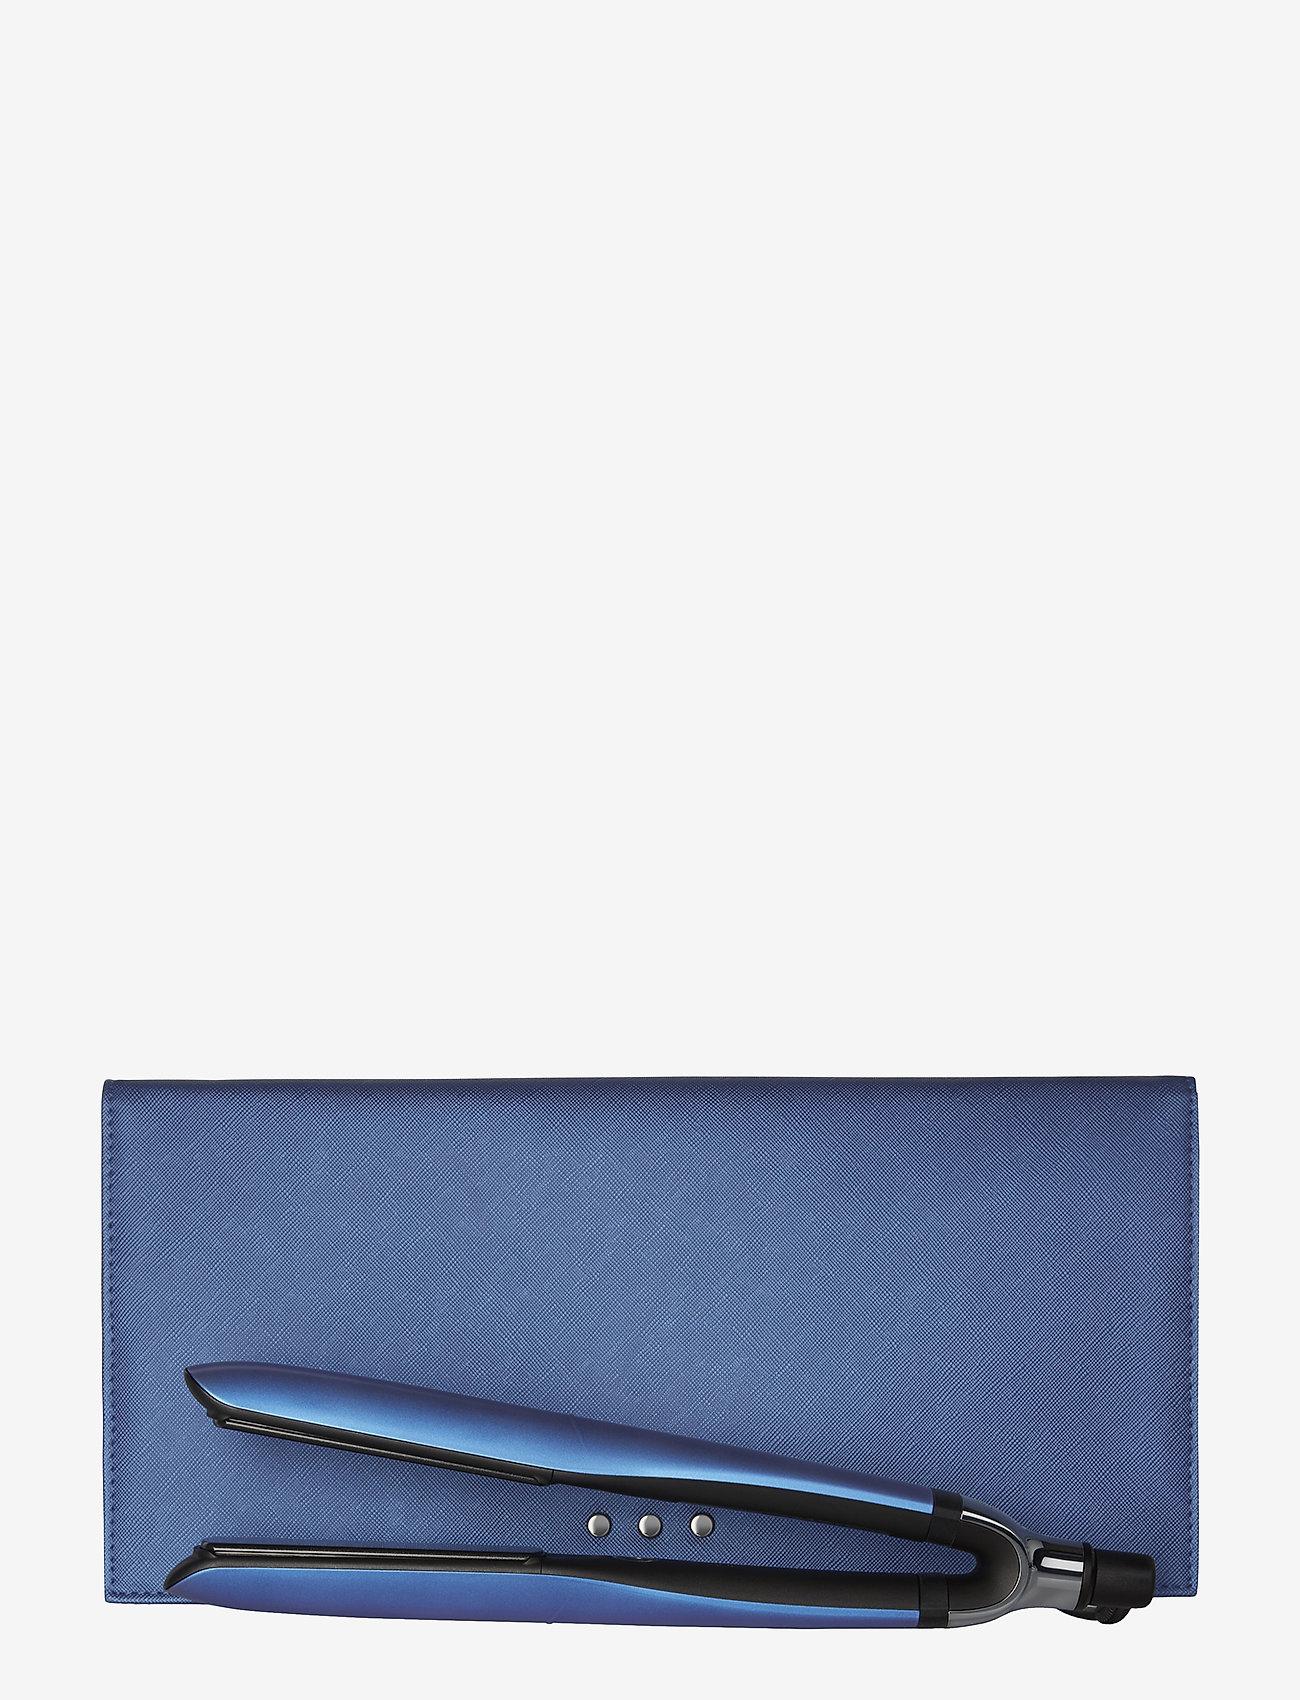 GHD - ghd upbeat Platinum+ cobalt blue styler - glattejern - cobalt blue - 1